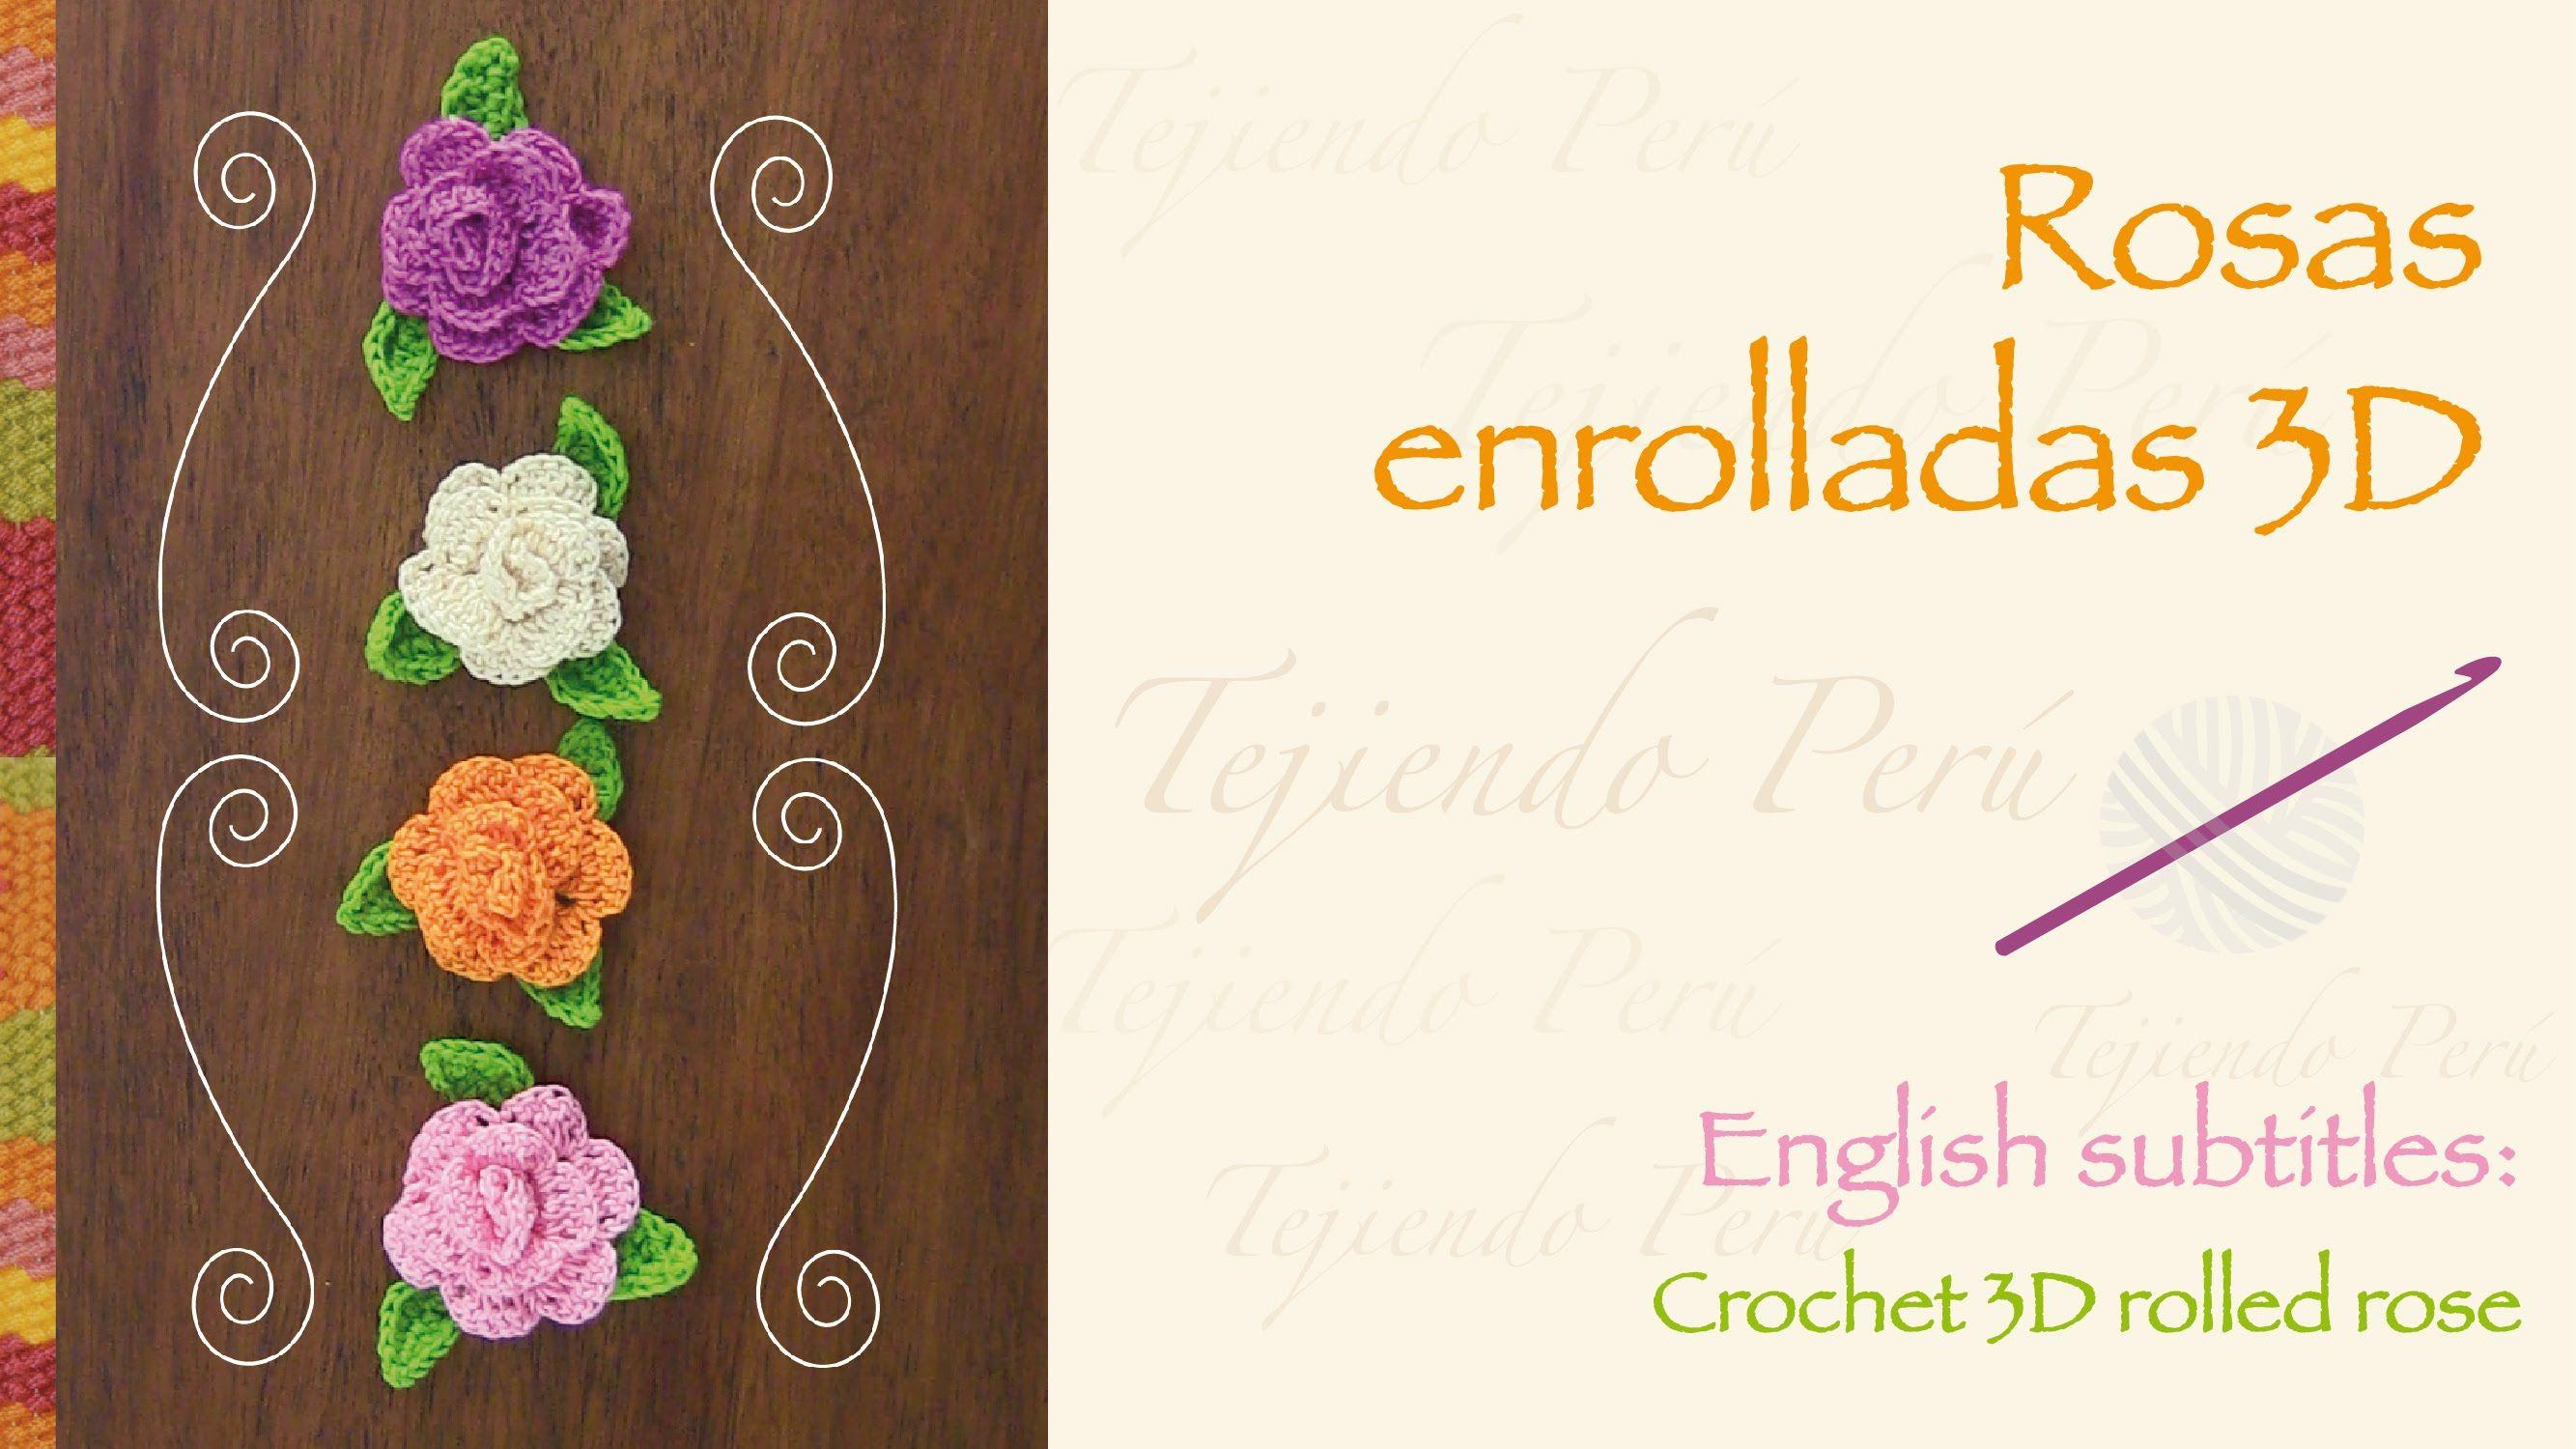 Paso a paso: rosas enrolladas 3D tejidas a crochet / English subtitles: 3D crochet rolled roses